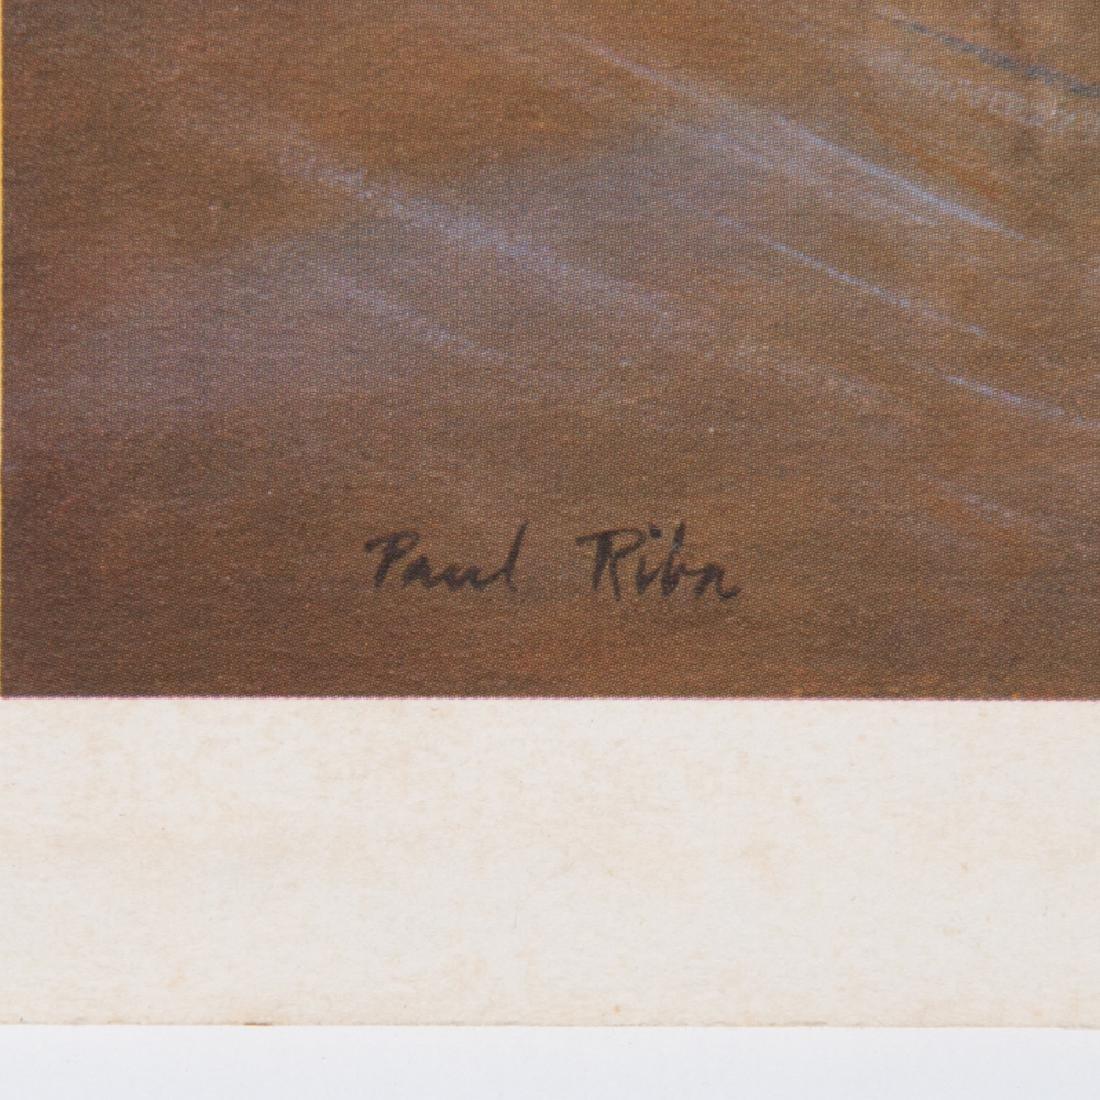 Paul Riba (1912-1977) A Group of Eight Studies, Pencil - 3